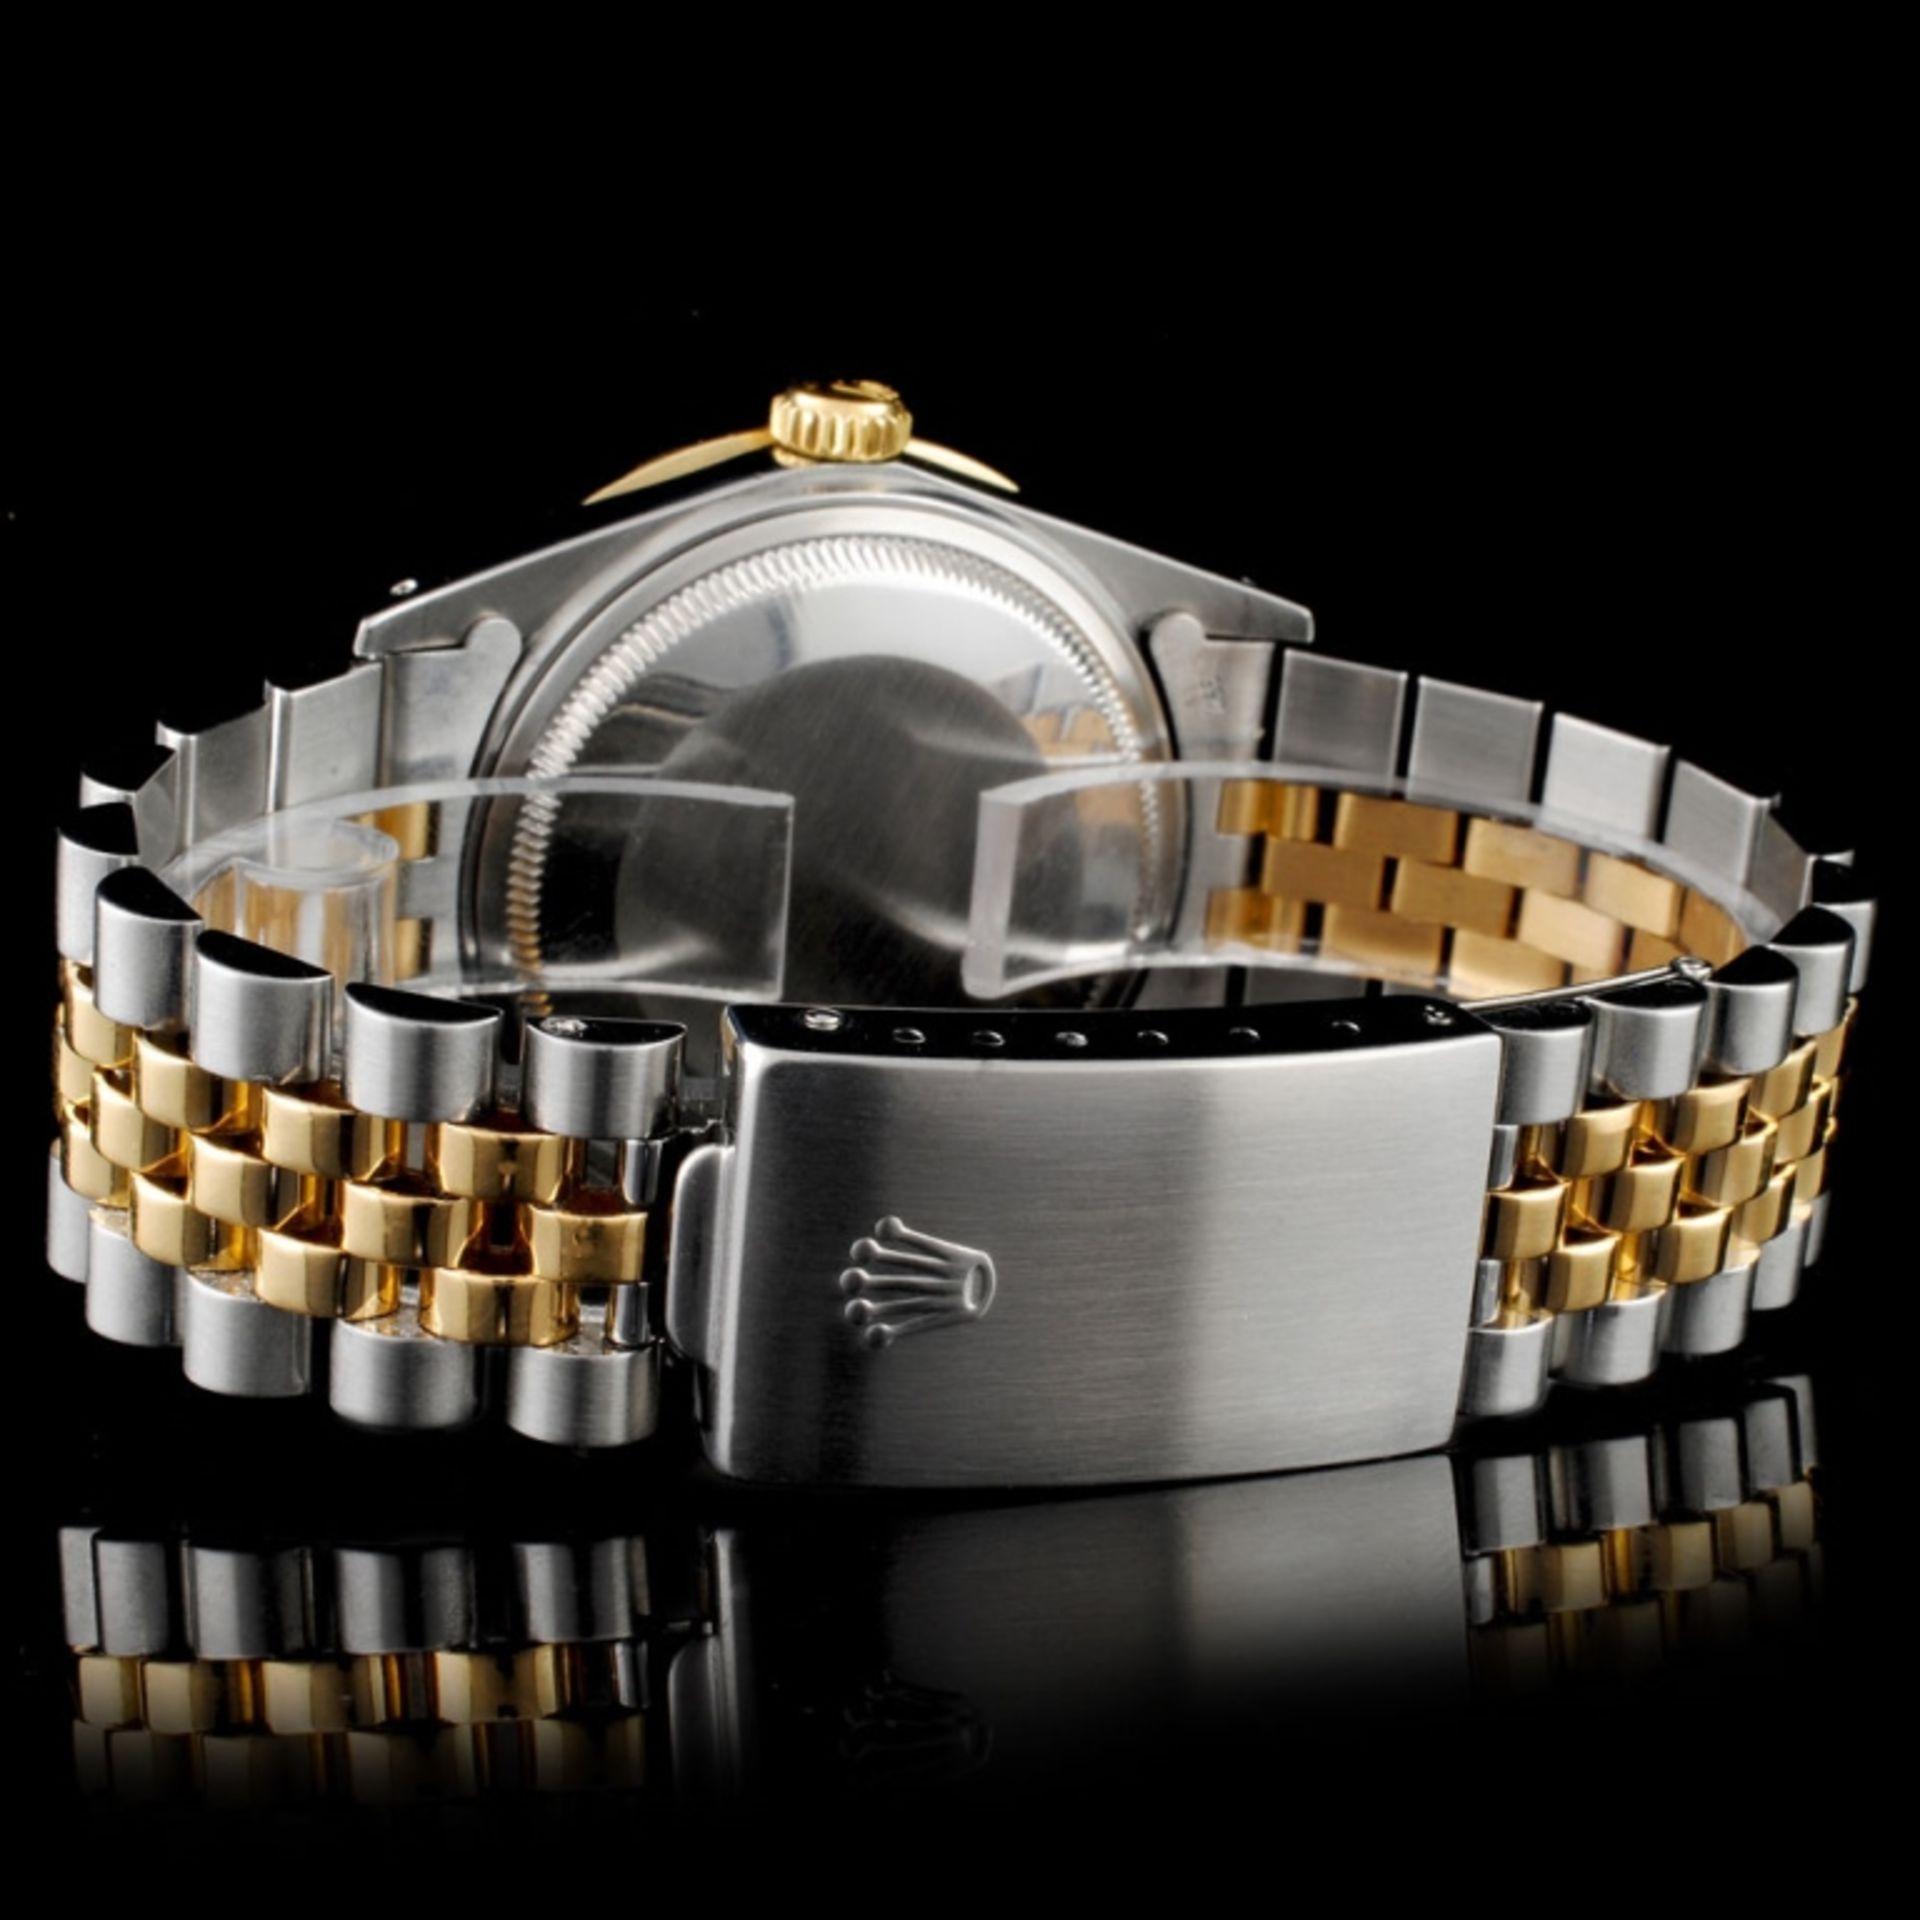 Rolex DateJust 36MM 1.50ct Diamond Wristwatch - Image 7 of 7